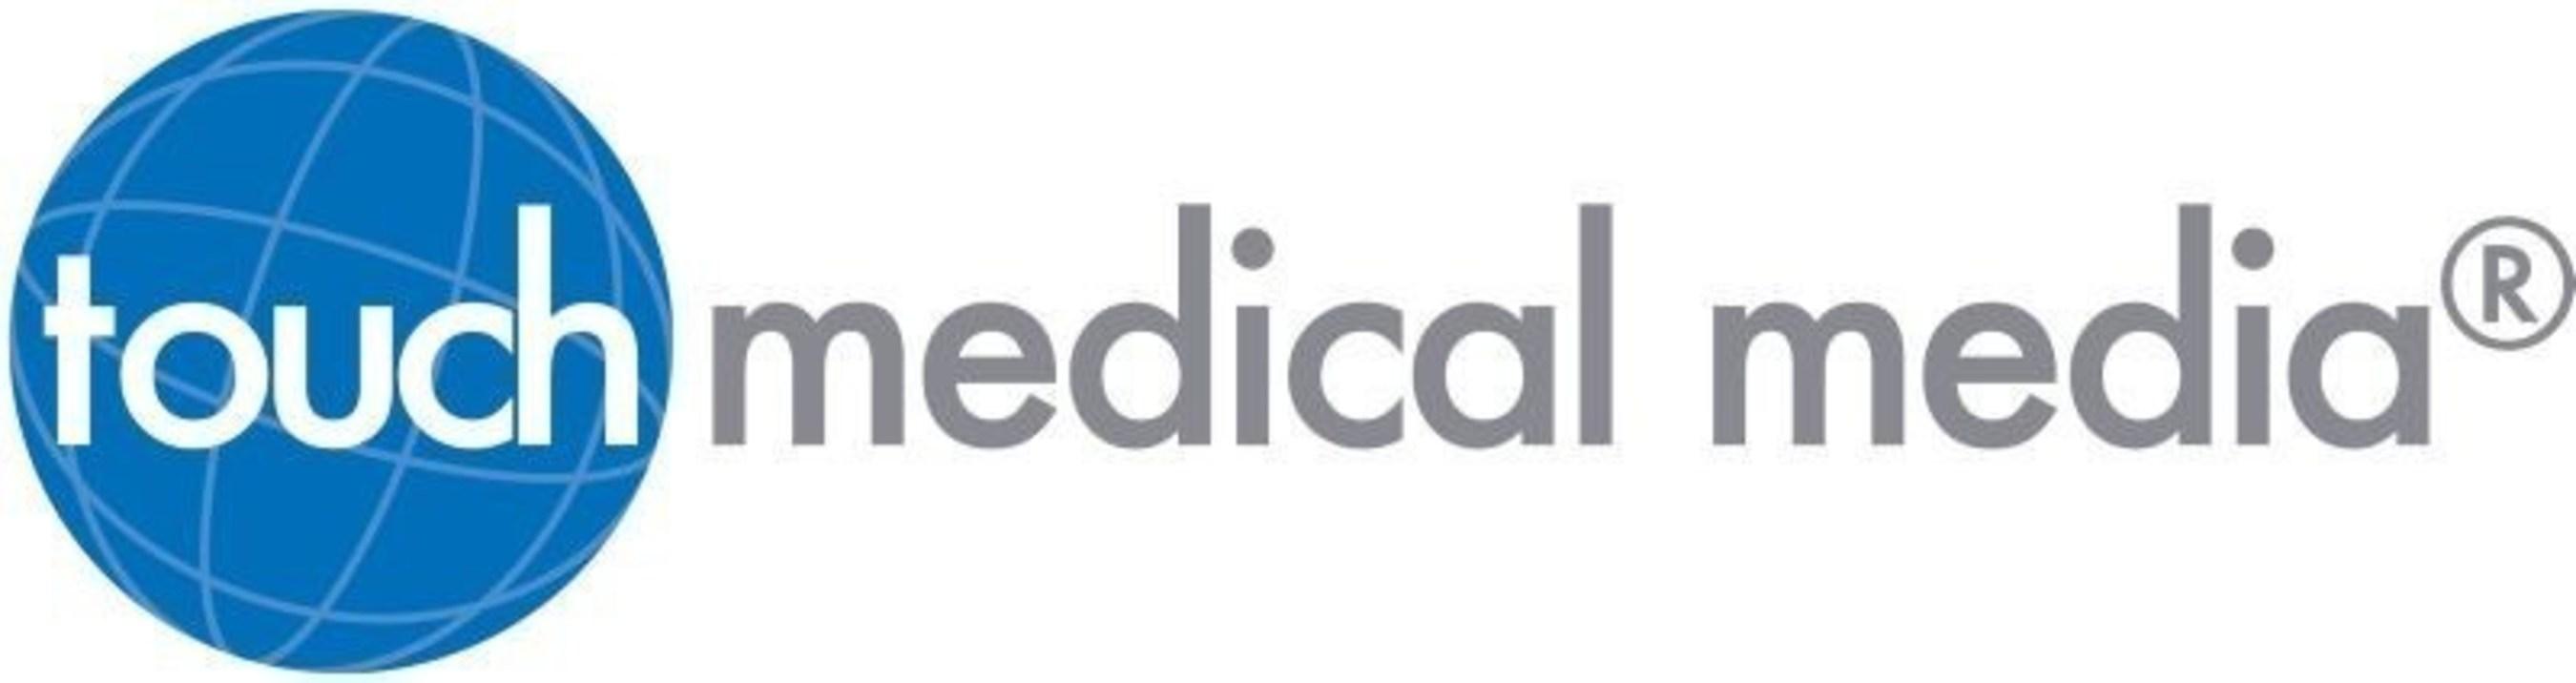 Touch Medical Media Logo (PRNewsFoto/Touch Medical Media) (PRNewsFoto/Touch Medical Media)